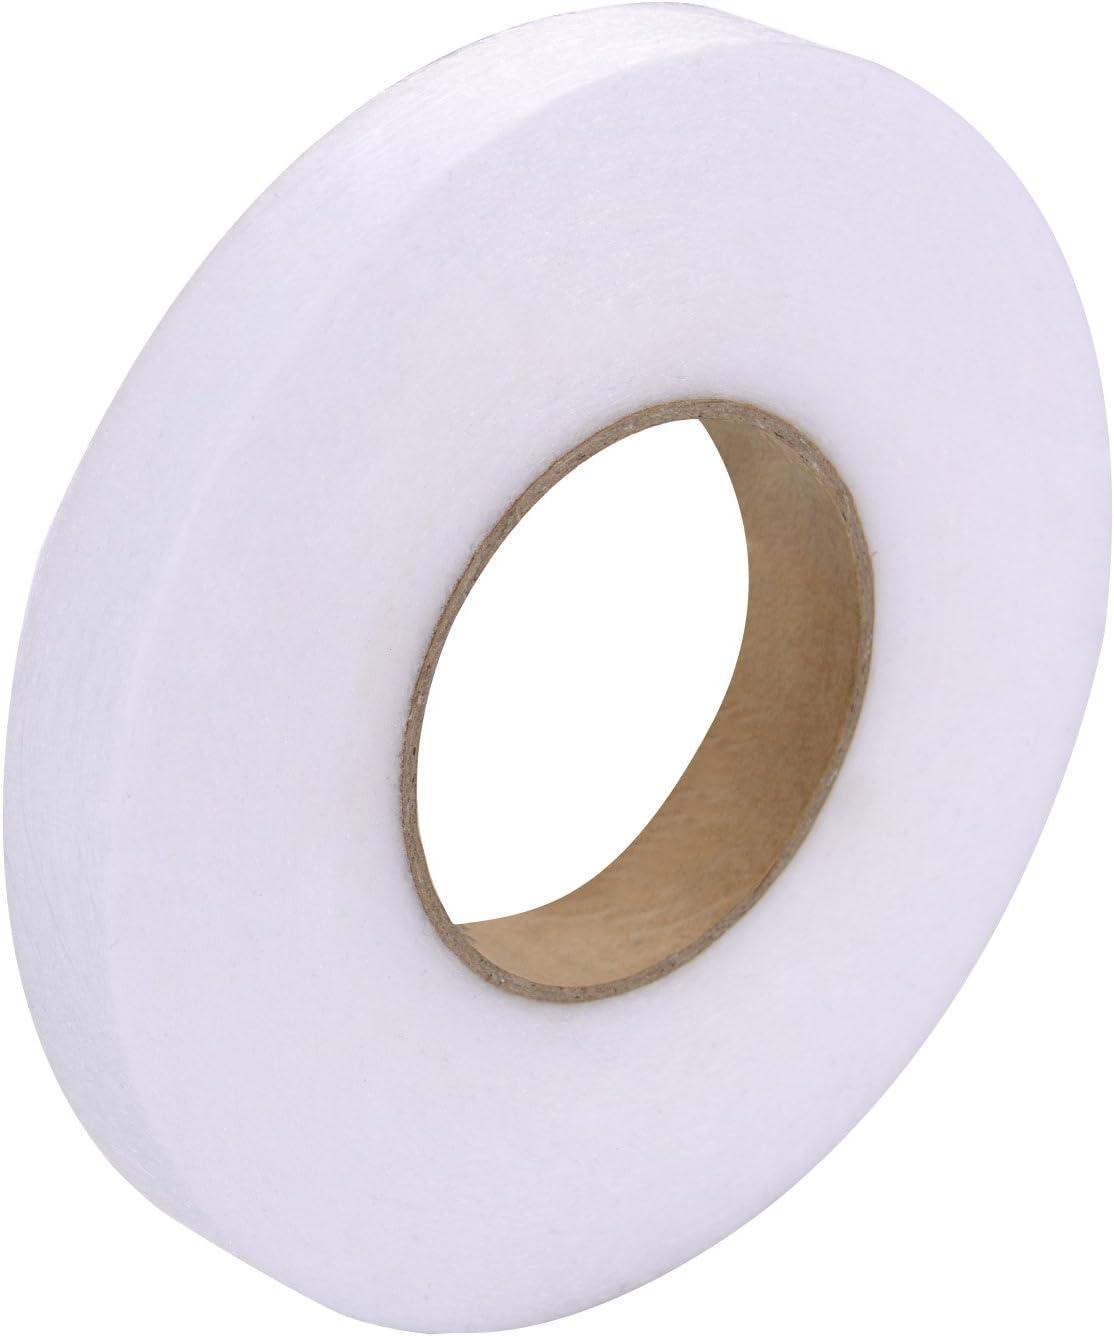 Hemming Web Fabric Fusing Tape Hem Tape Adhesive Iron-on Hemming Tape 20 m